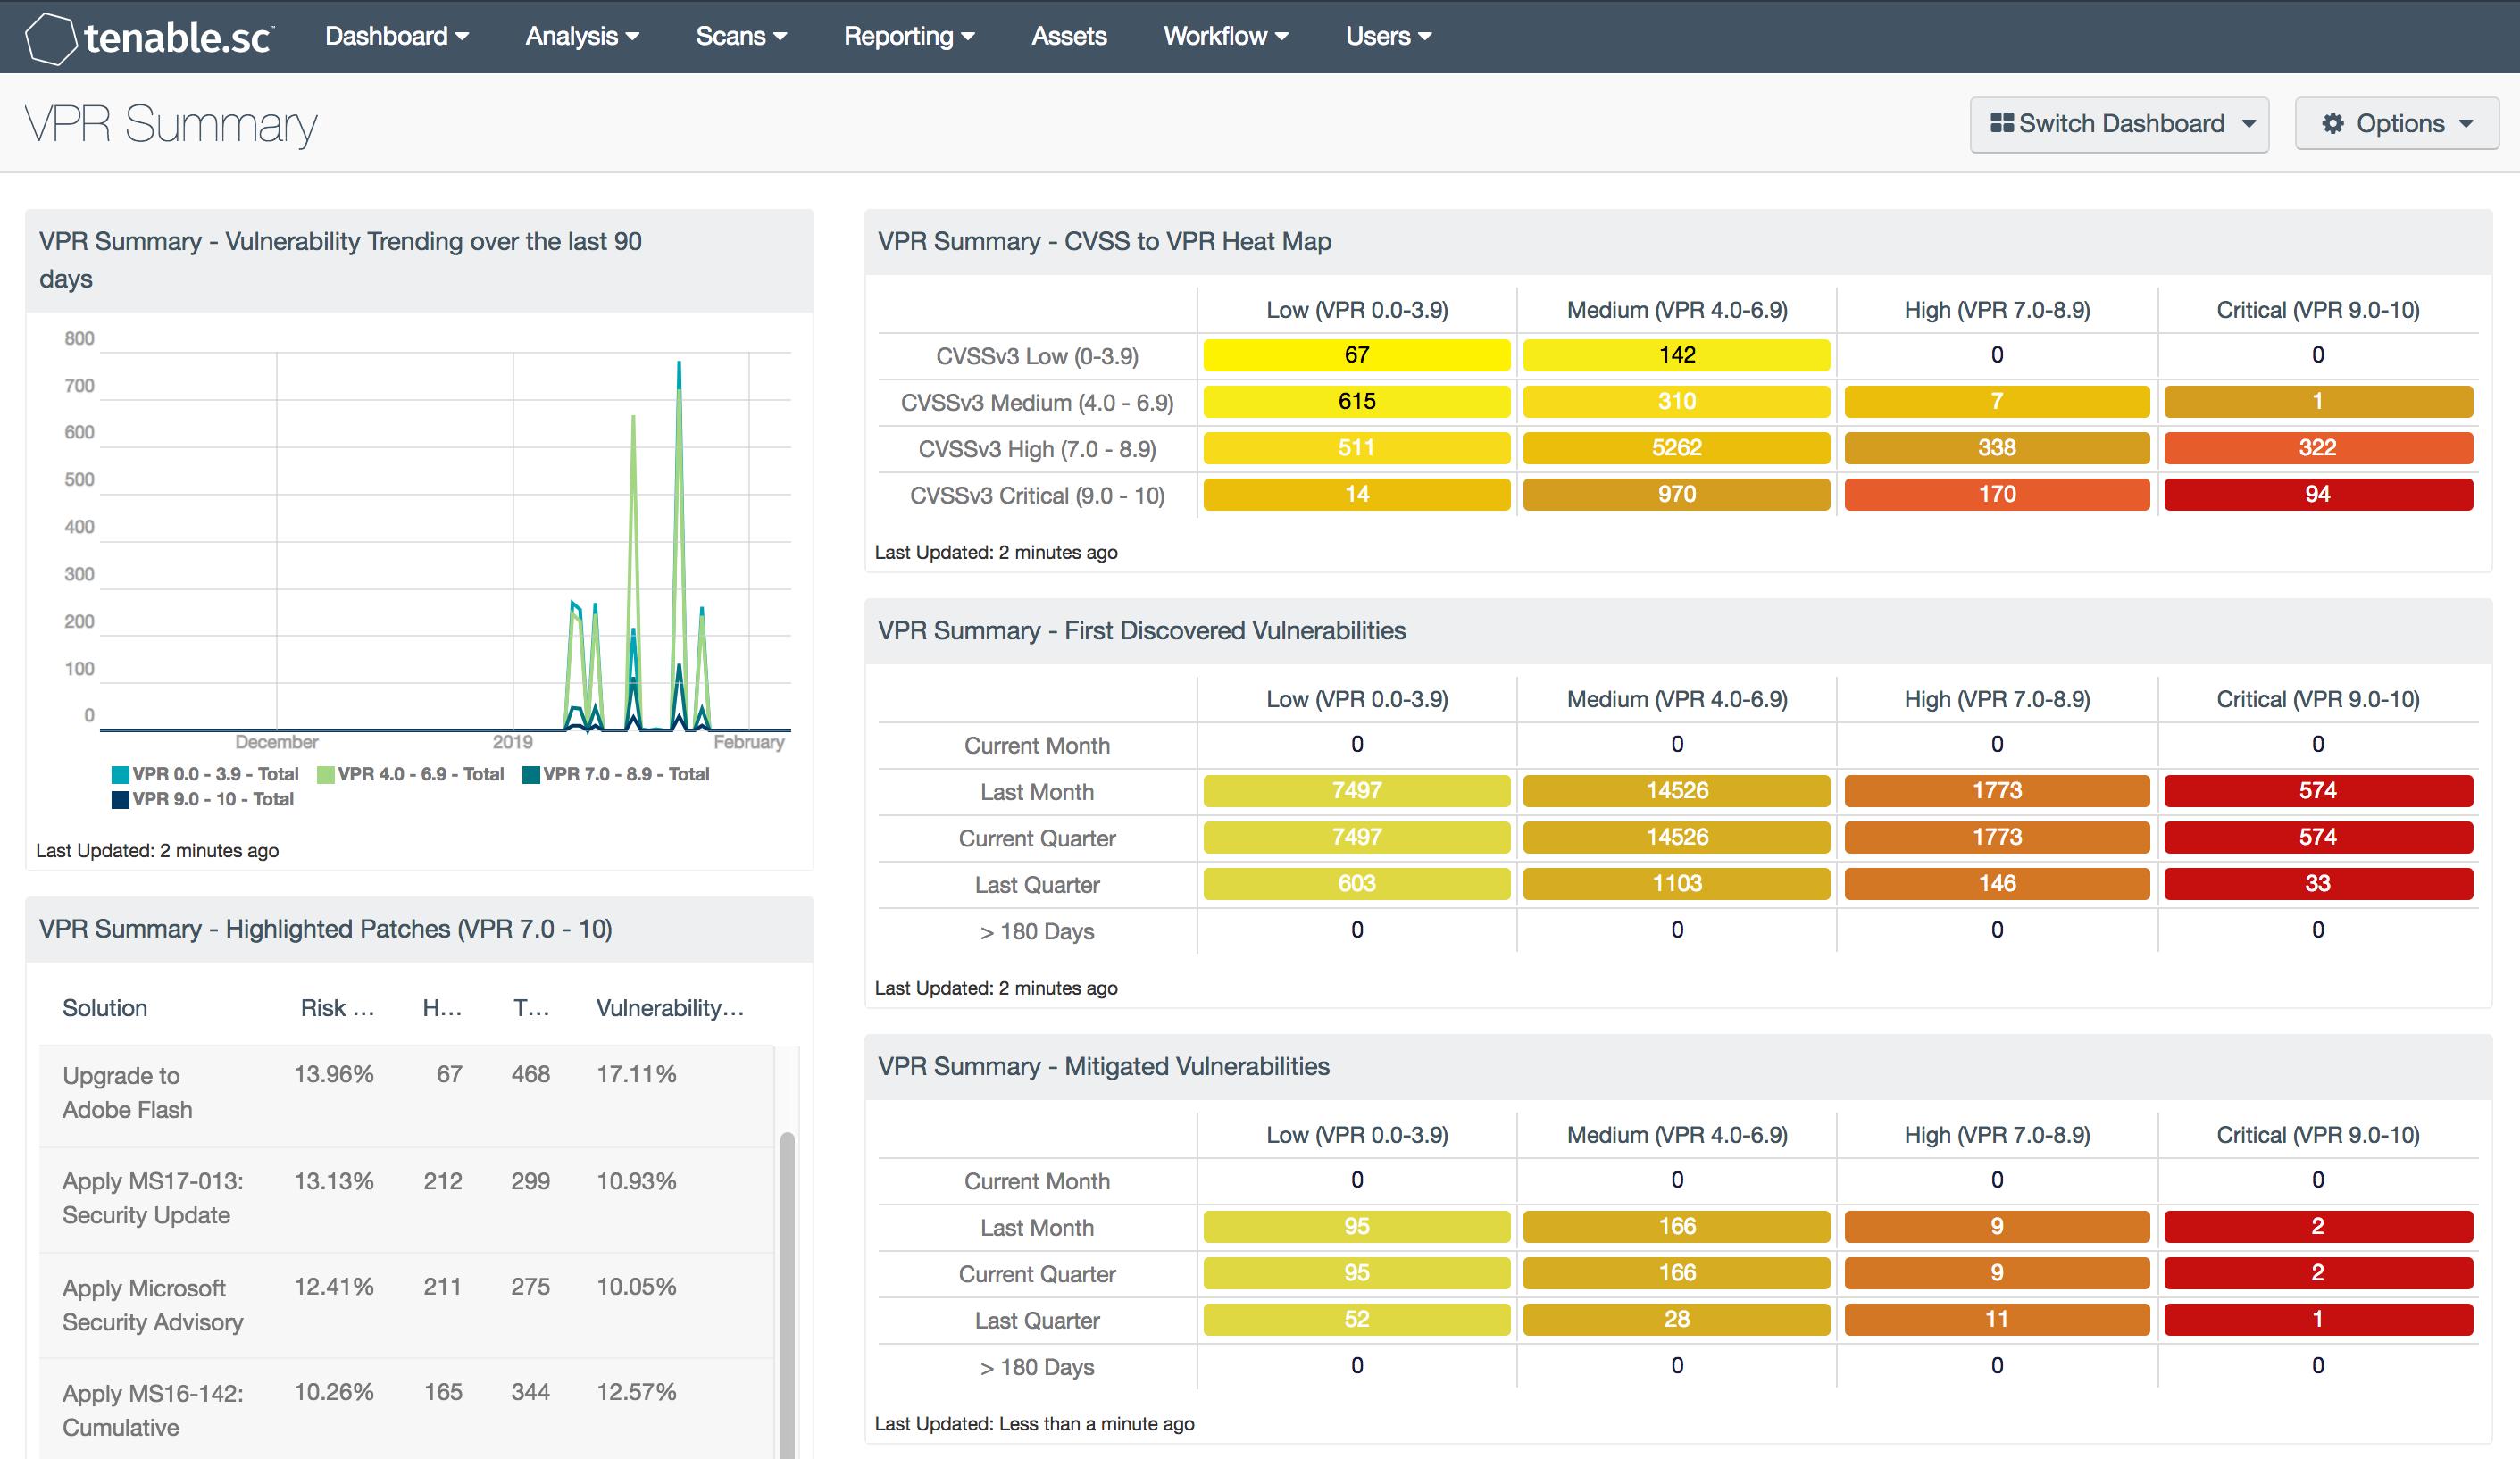 Vulnerability Priority Rating (VPR) Summary - SC Dashboard